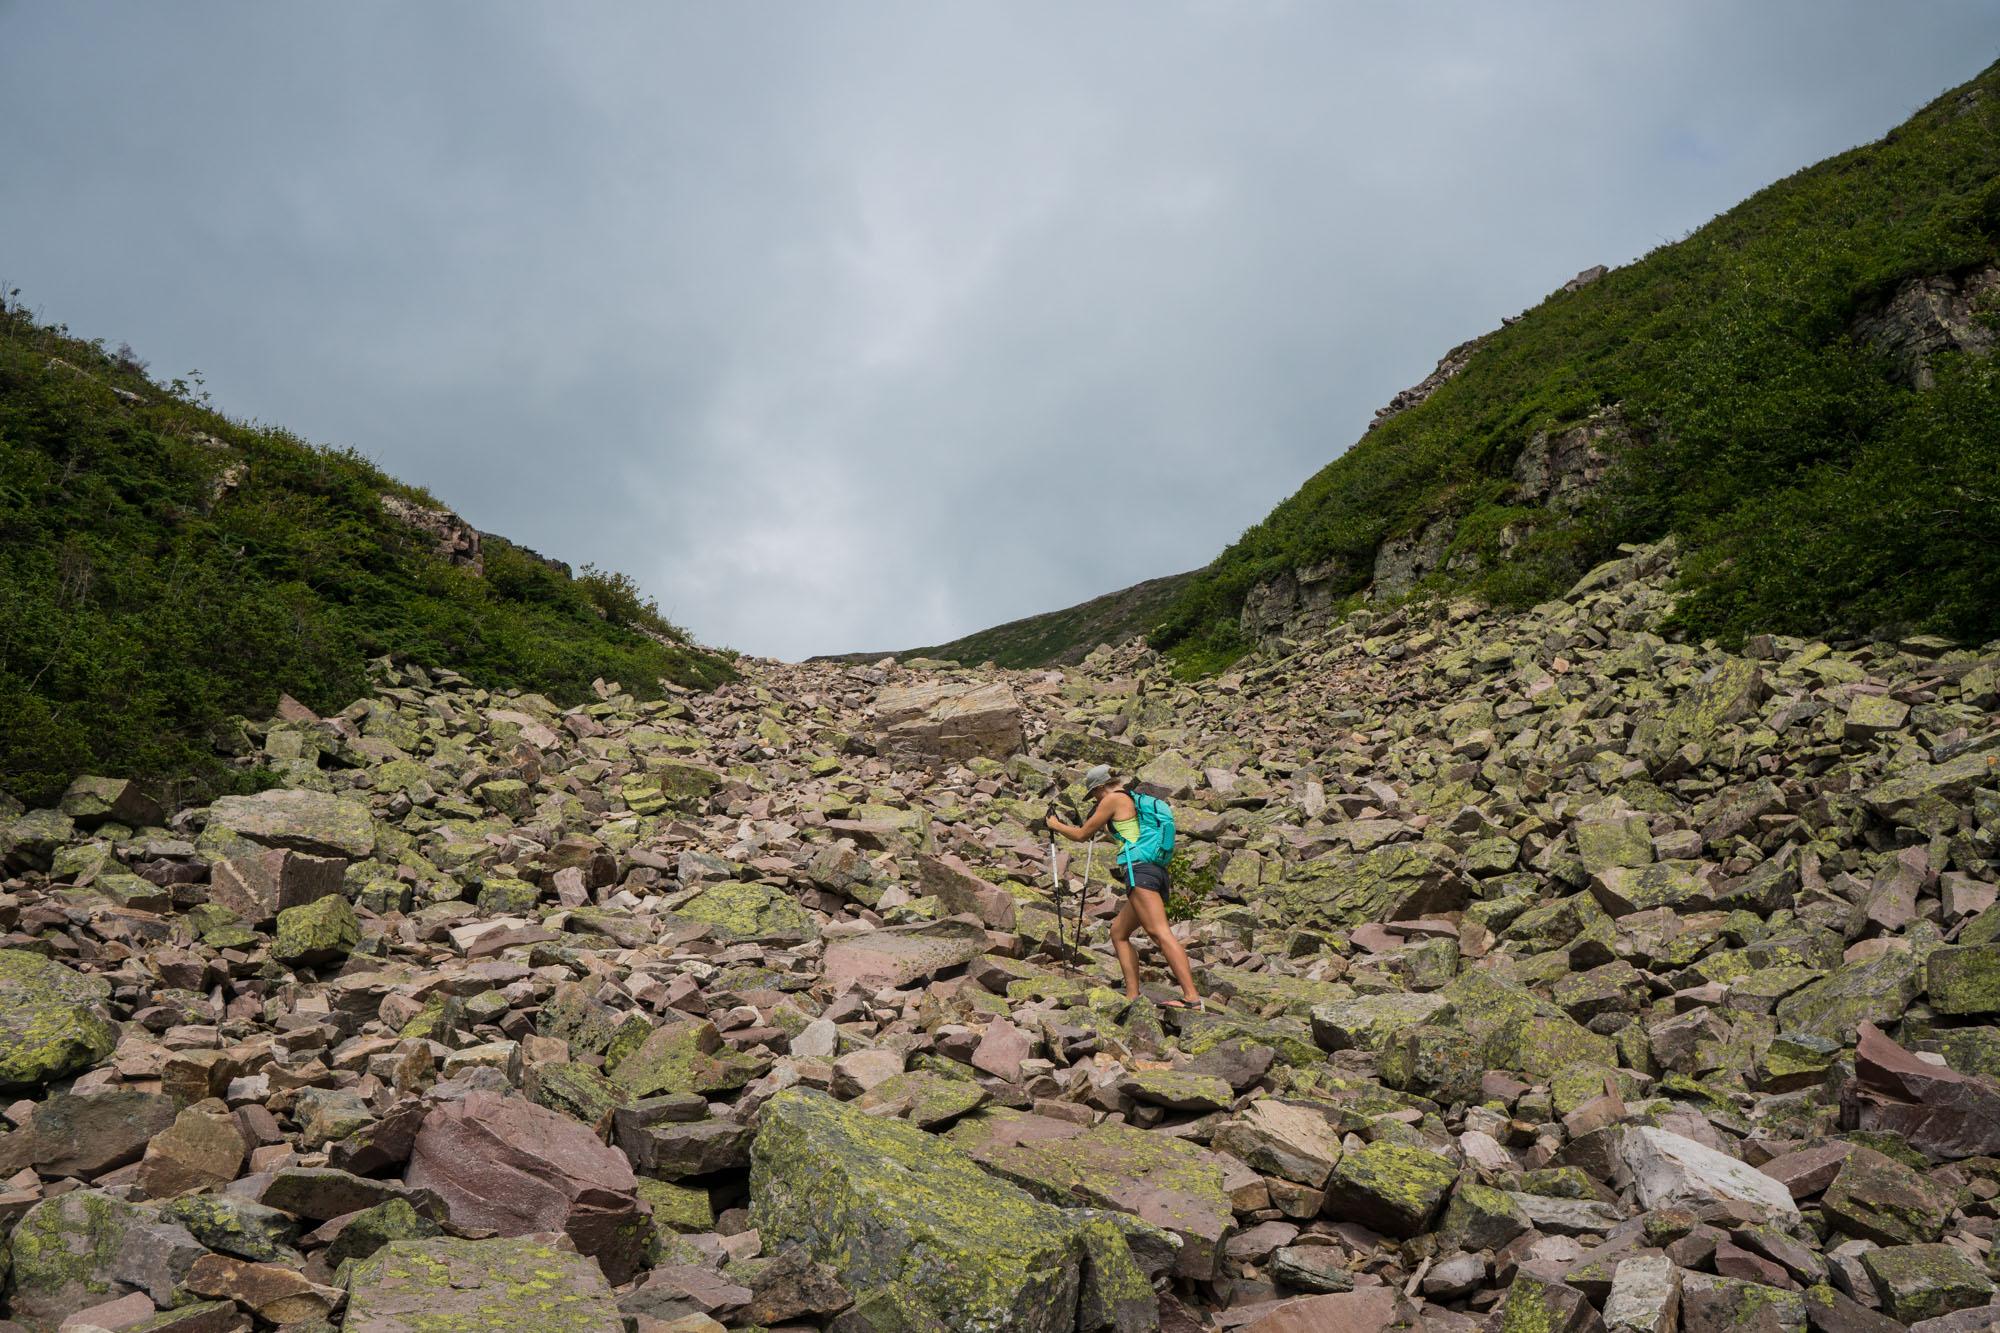 Steep climb to the summit